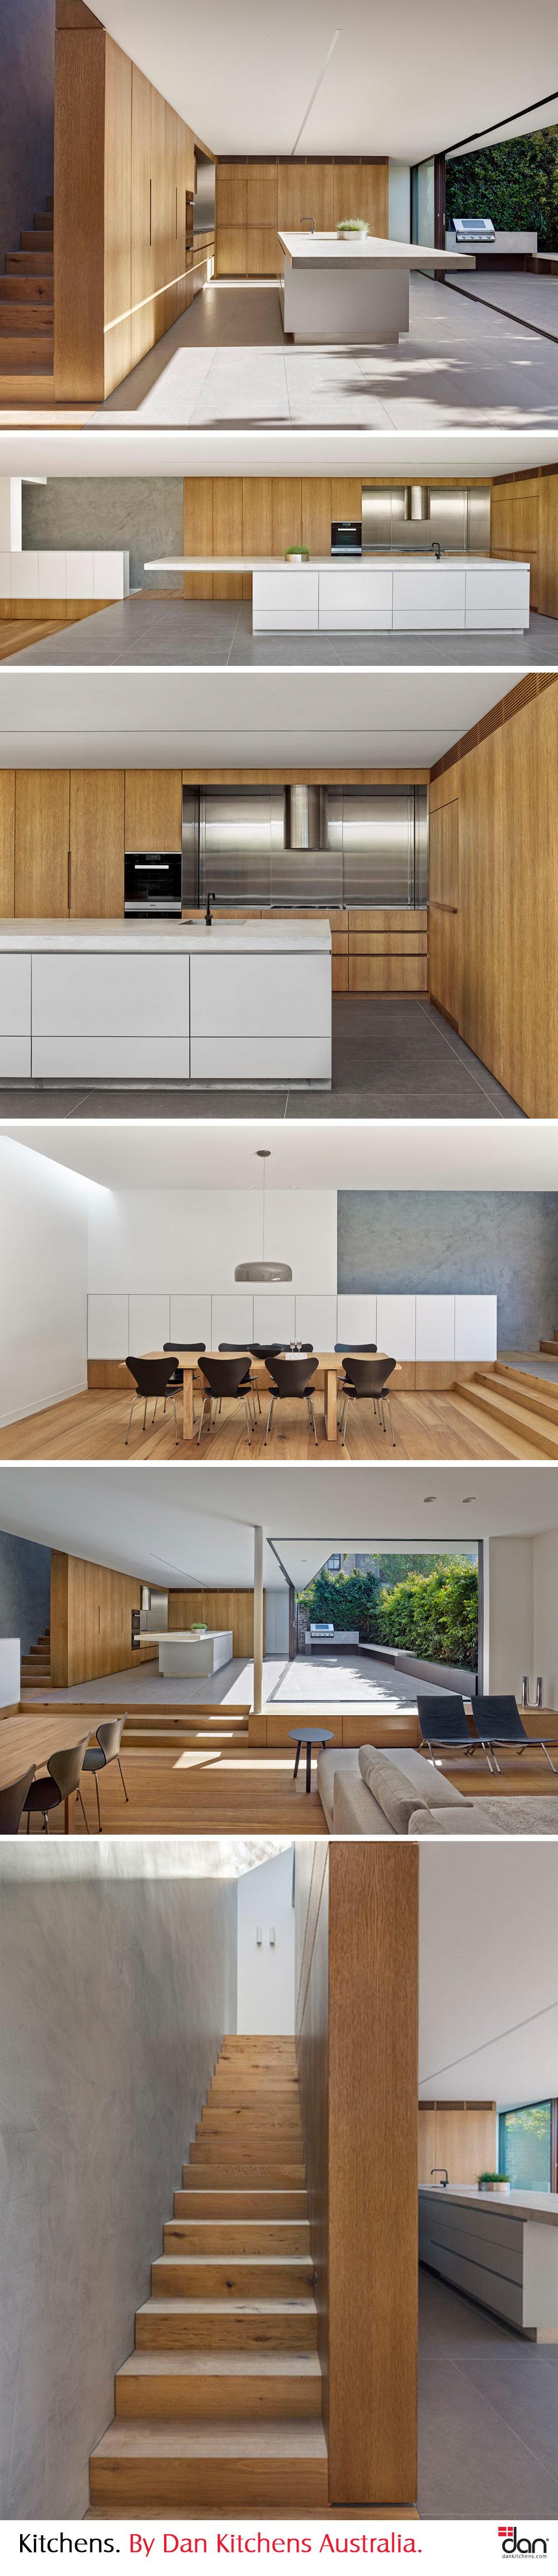 Custom Joinery Sydney Bespoke Designs Kitchen design